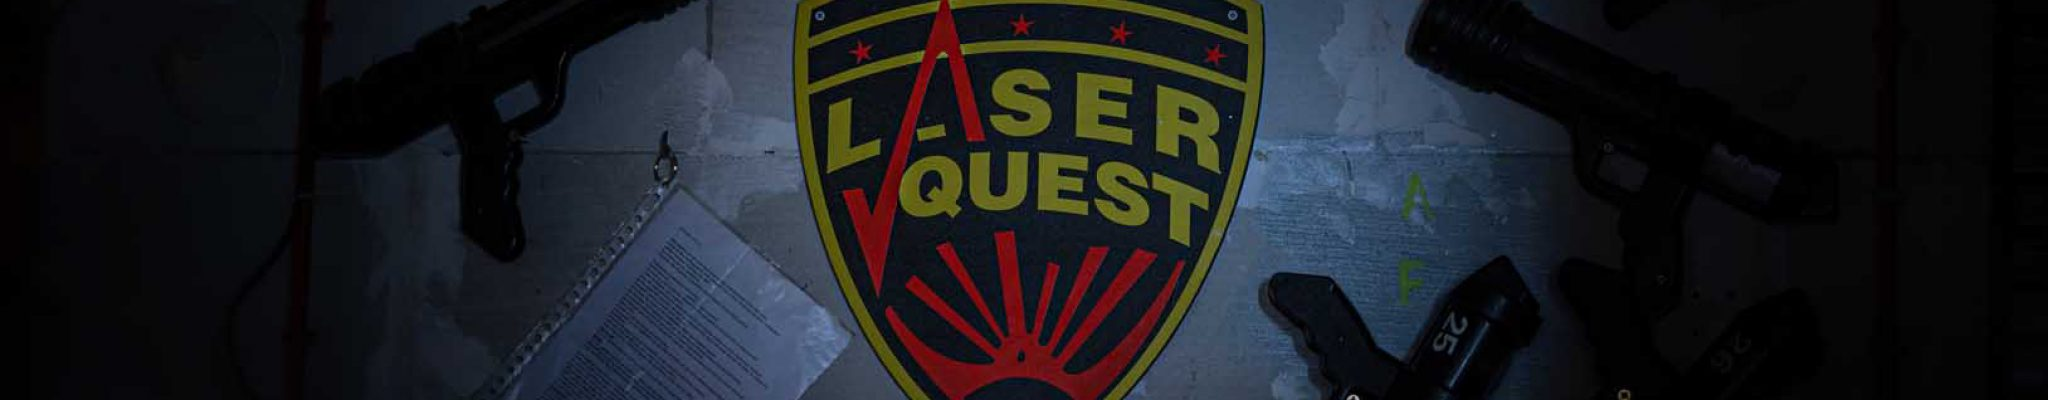 Laserquest logo on wall